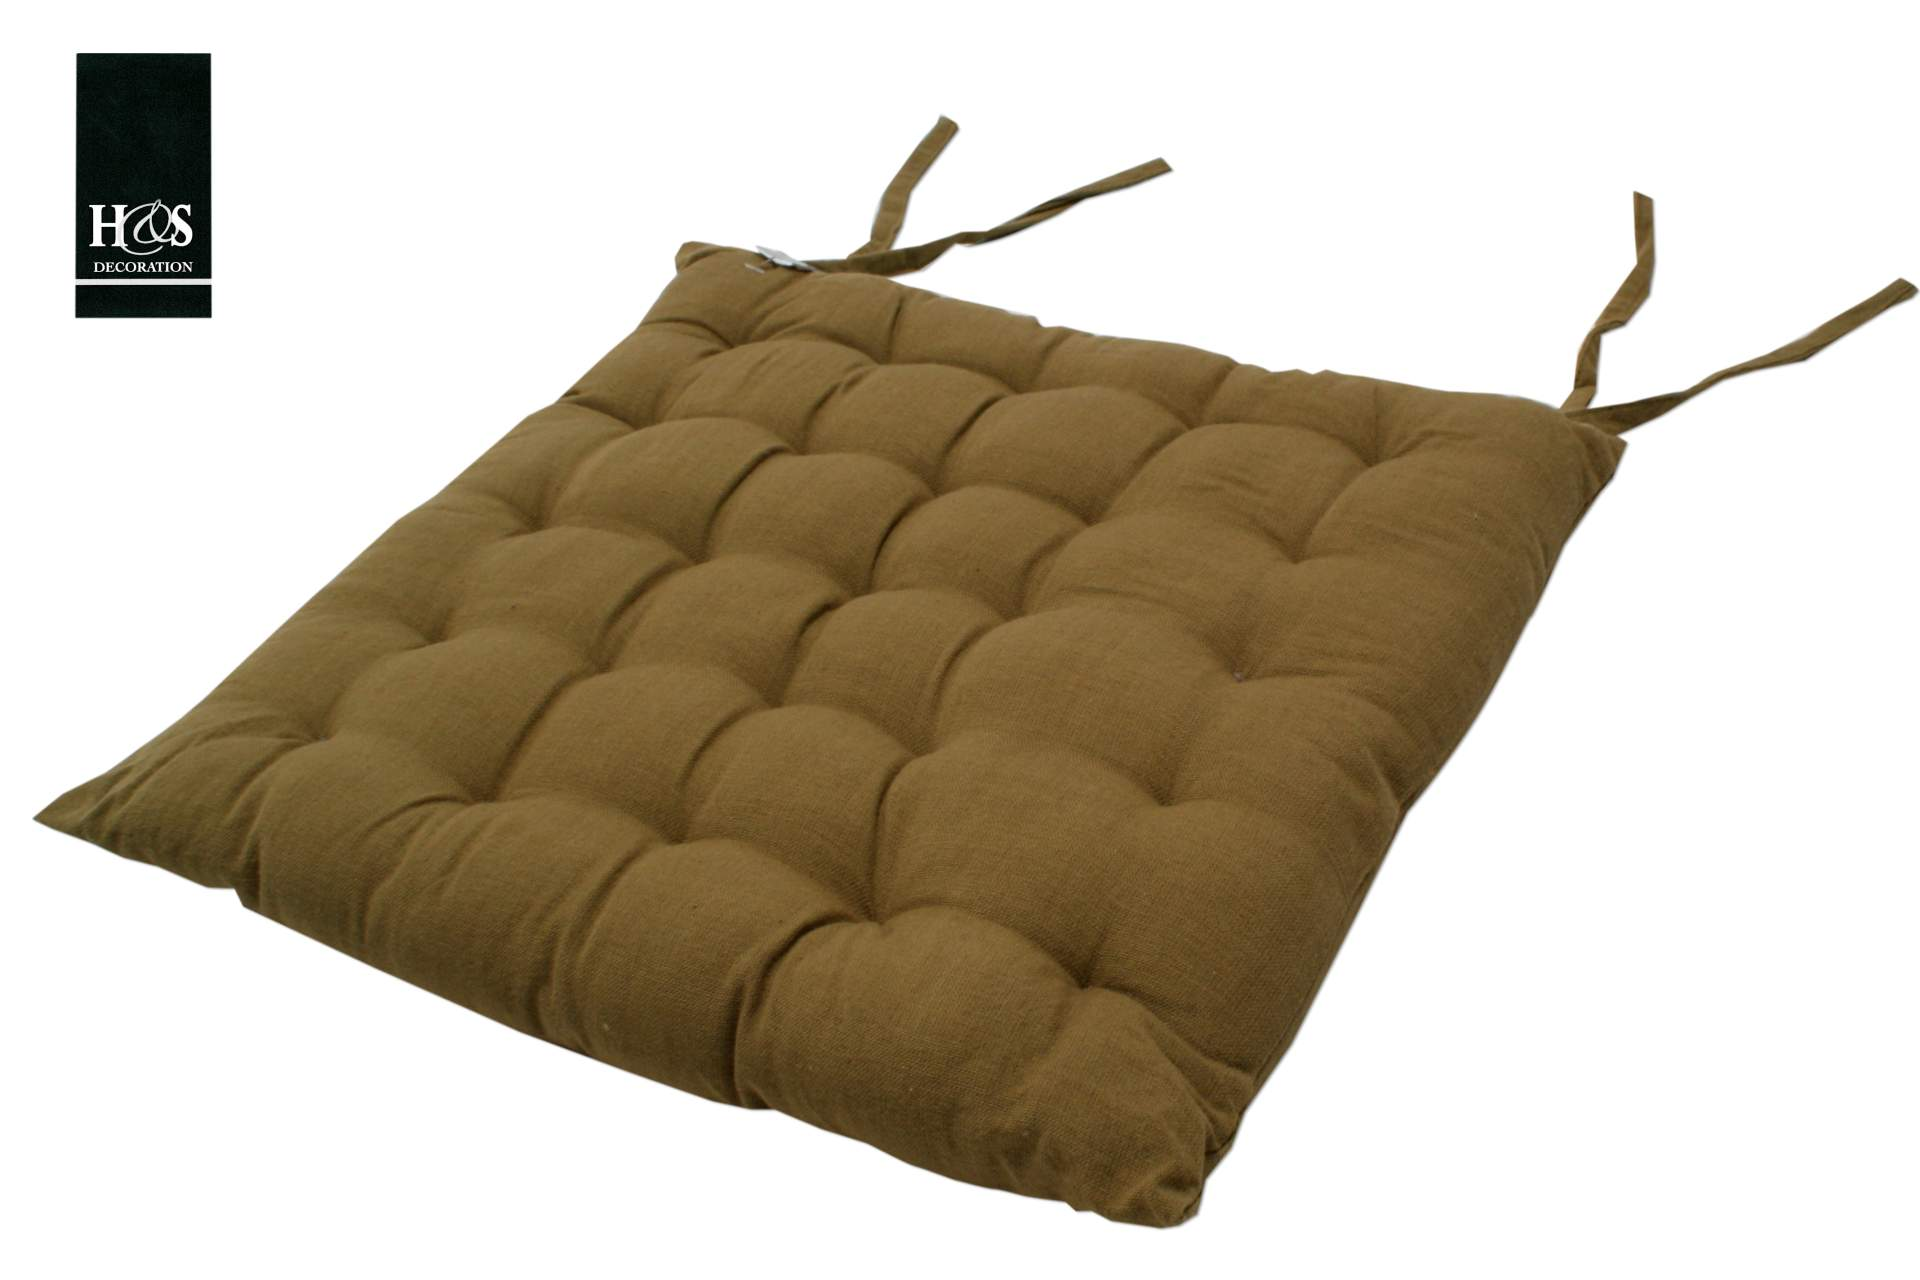 Sitzkissen 40 X 40 Cm Khaki Stuhl Kissen Baumwolle